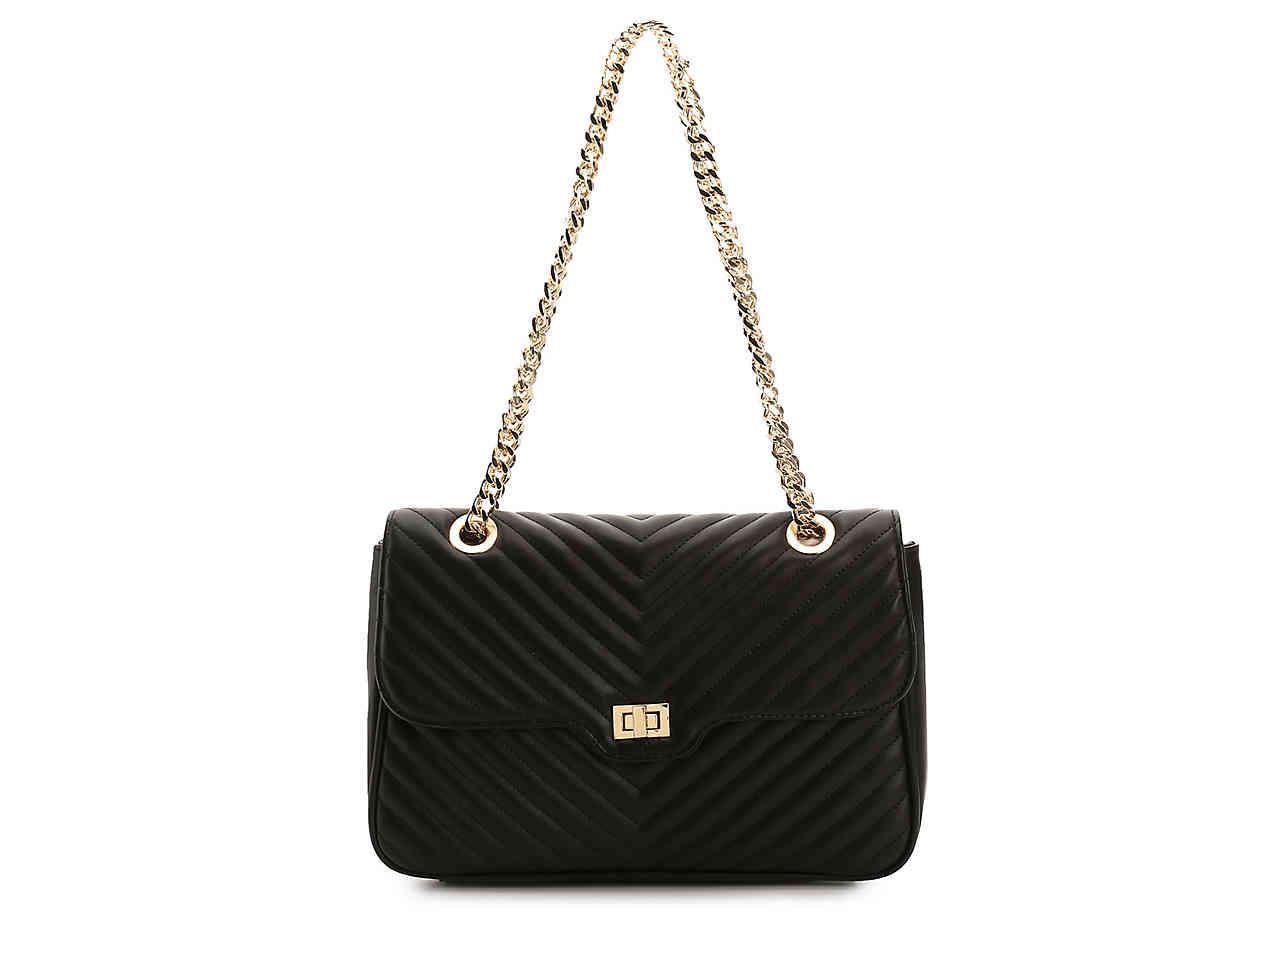 Steve Madden Women S Black Bbarbie Convertible Shoulder Bag